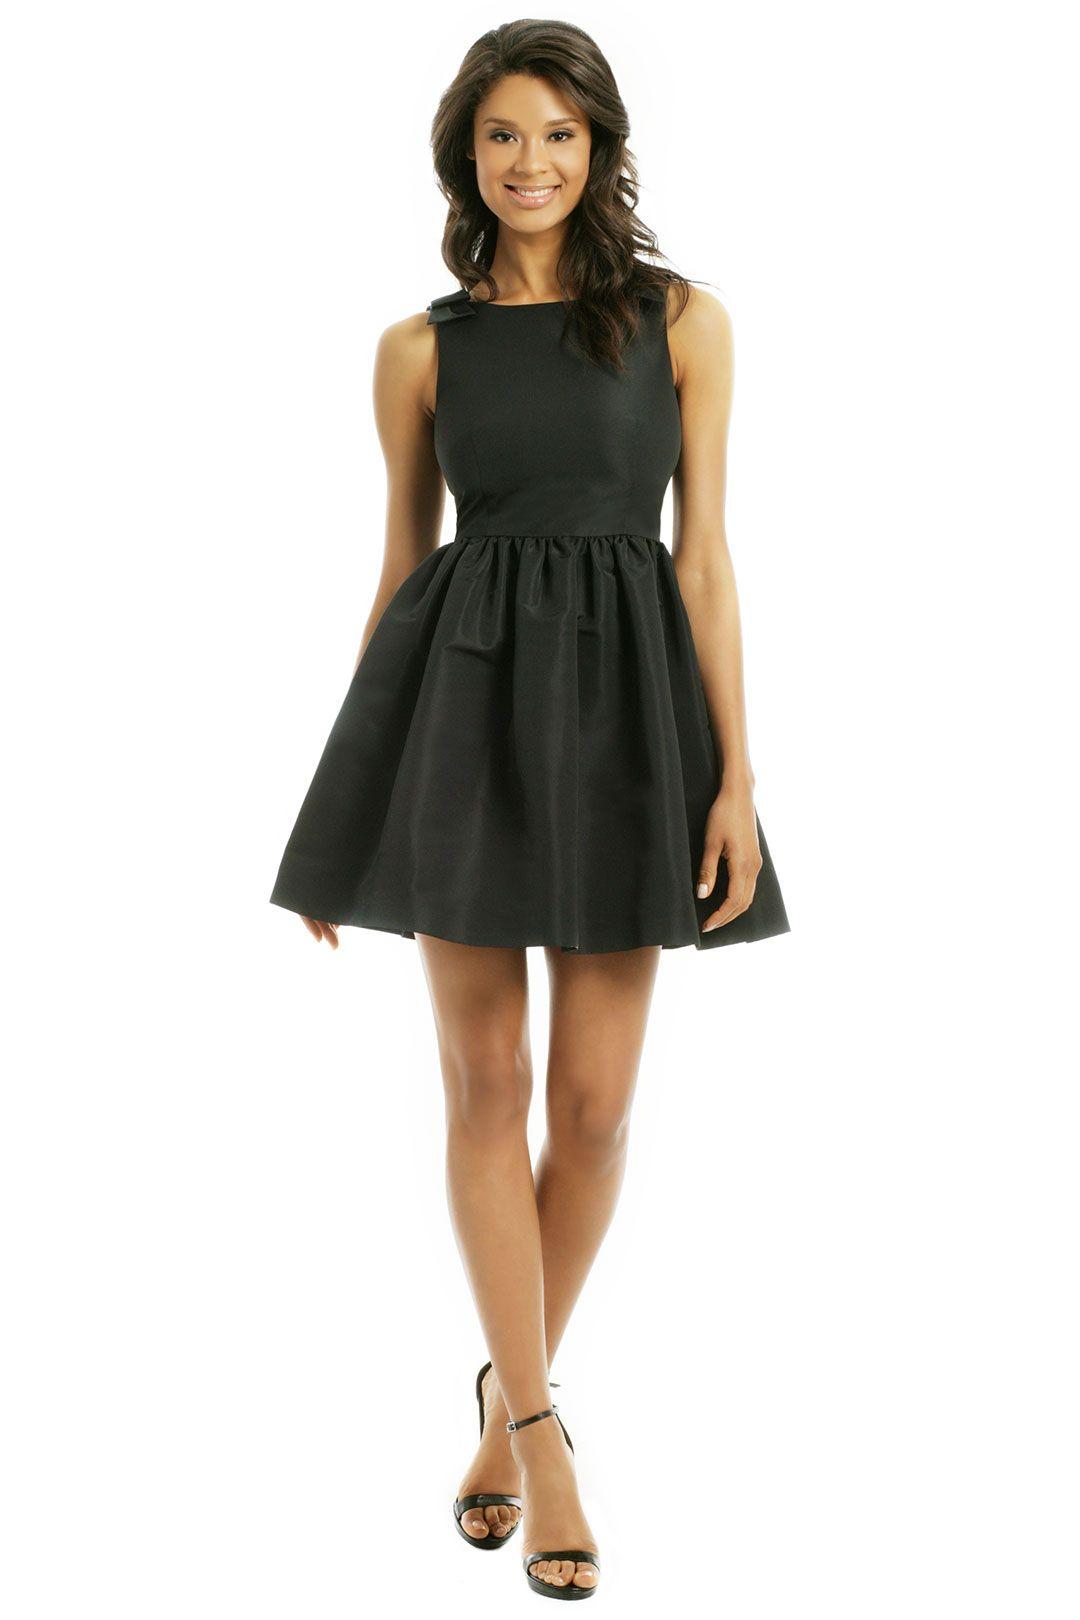 Red Valentino Runaway Bow Tie Dress Black Tie Event Dresses Event Dresses Short Bow Tie Dress